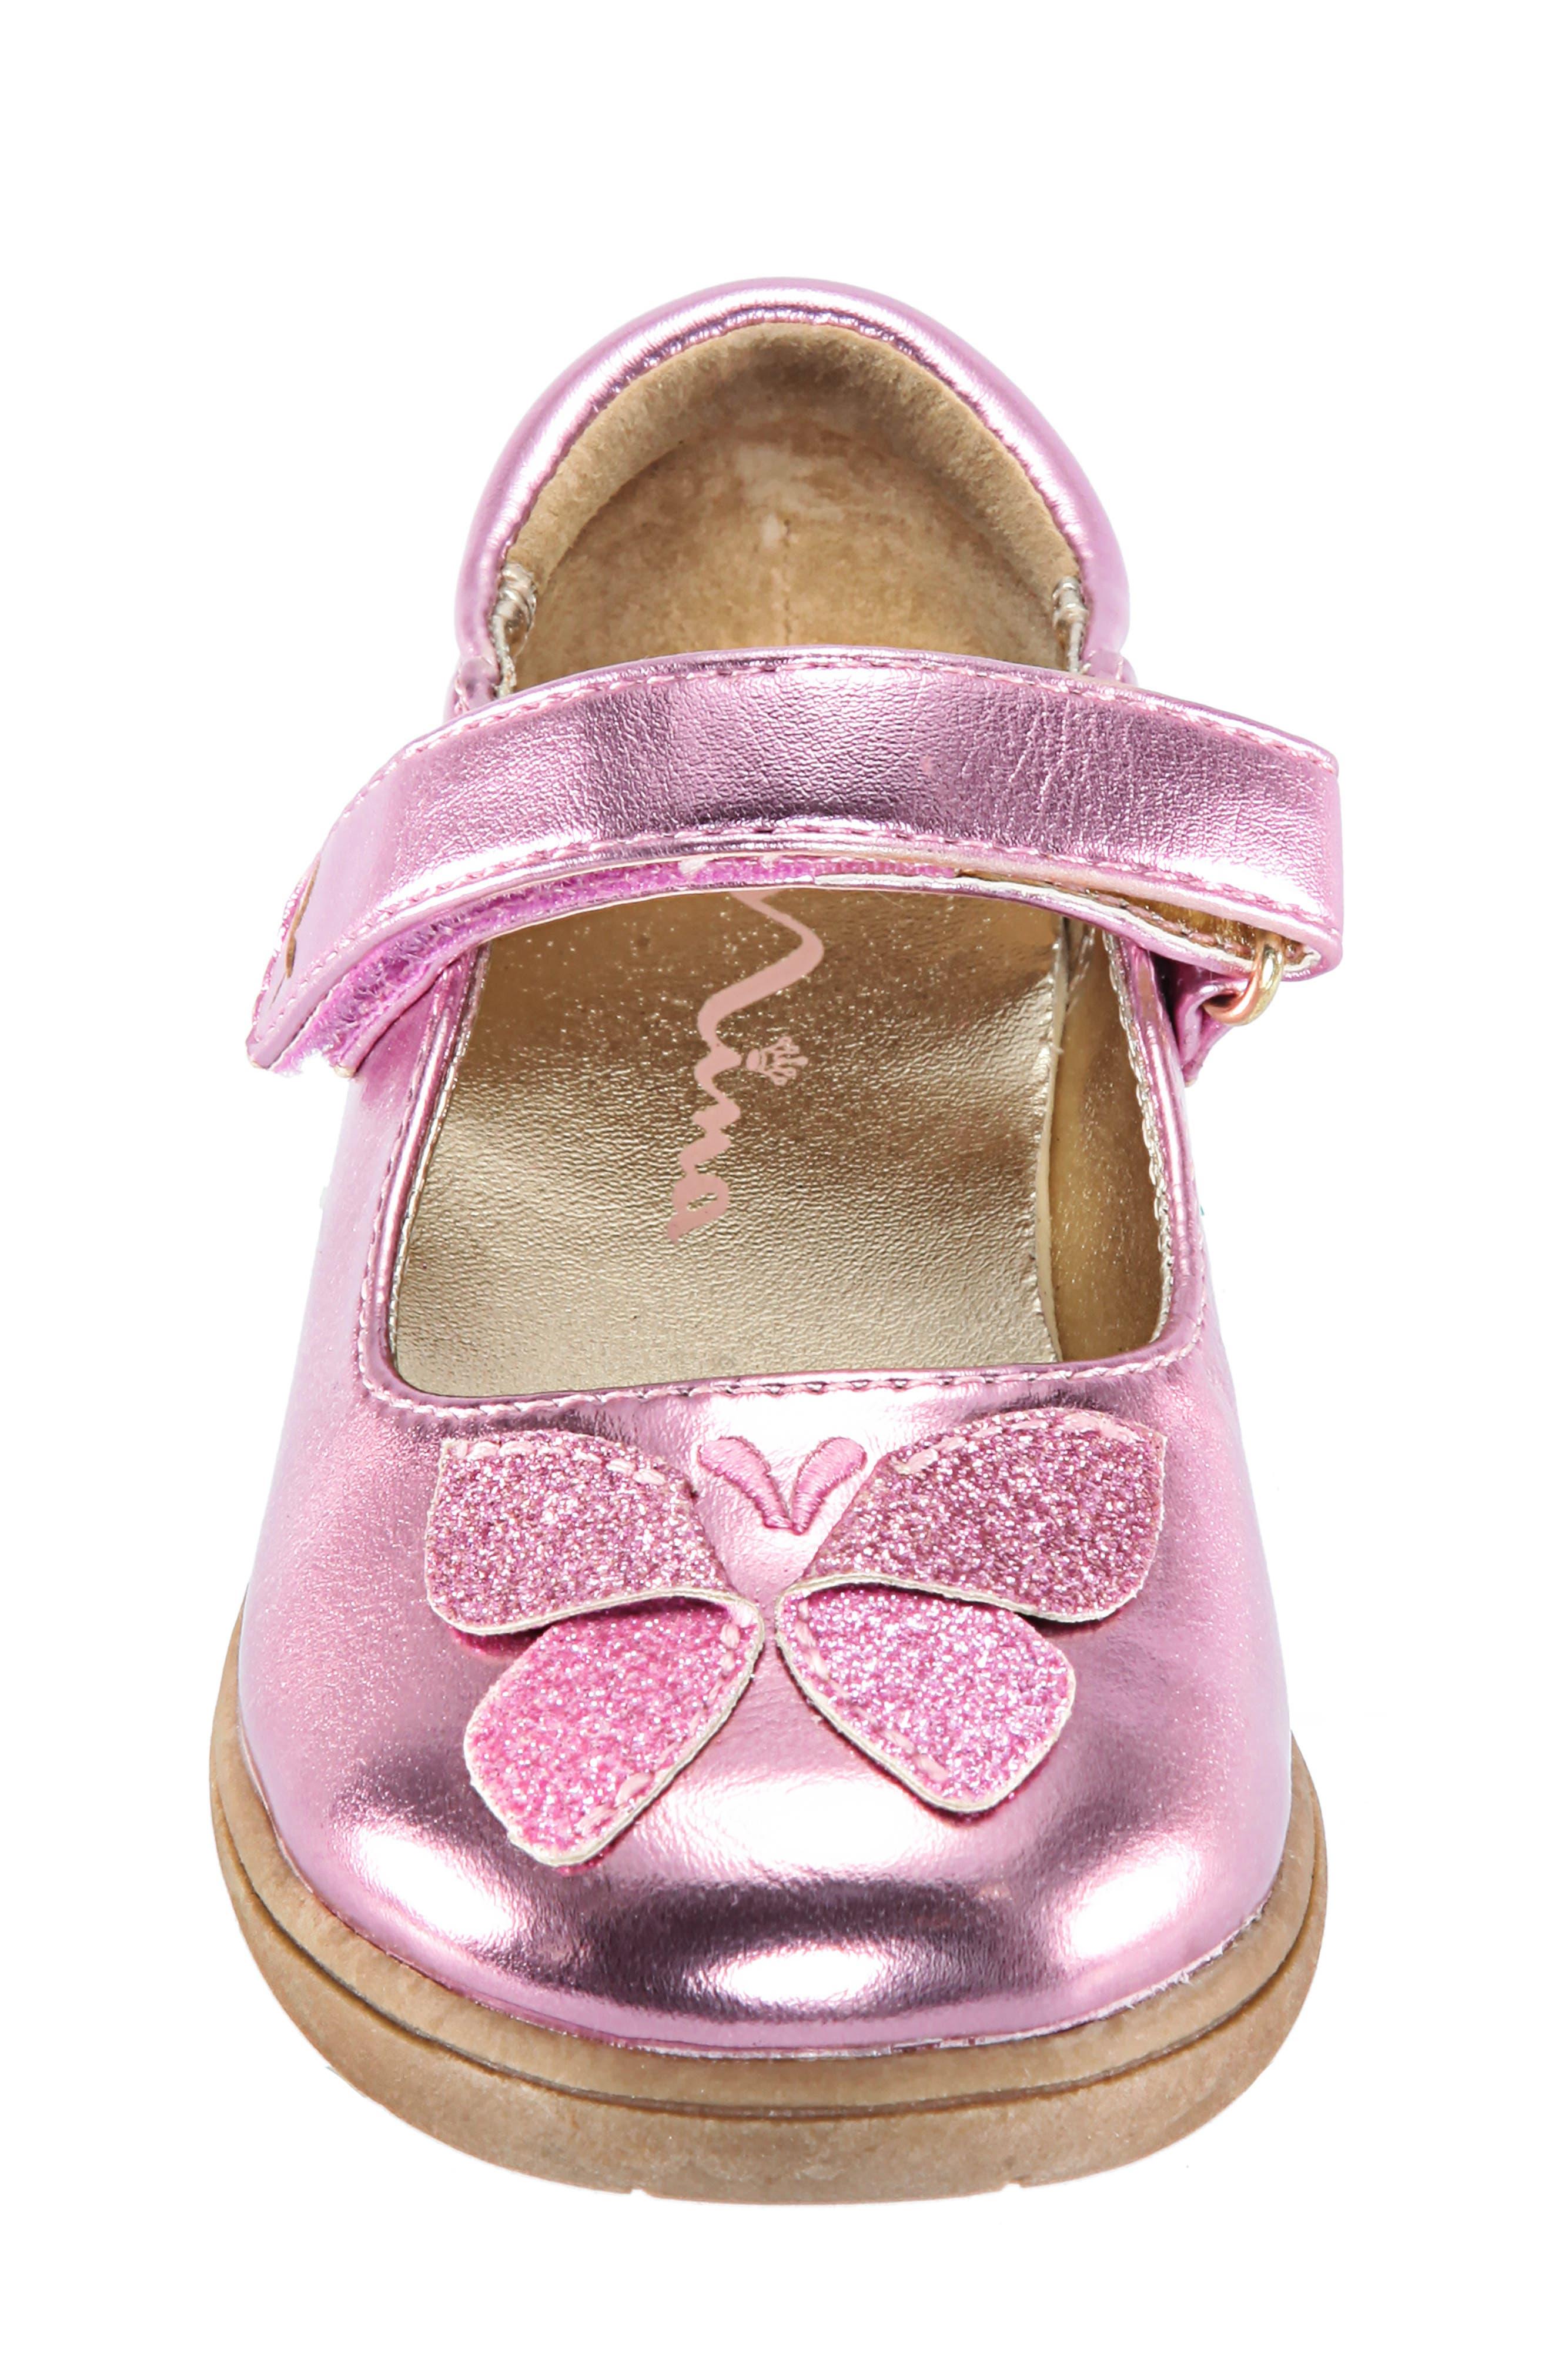 Alysha Glitter Mary Jane,                             Alternate thumbnail 4, color,                             PINK/ SMOOTH GLITTER